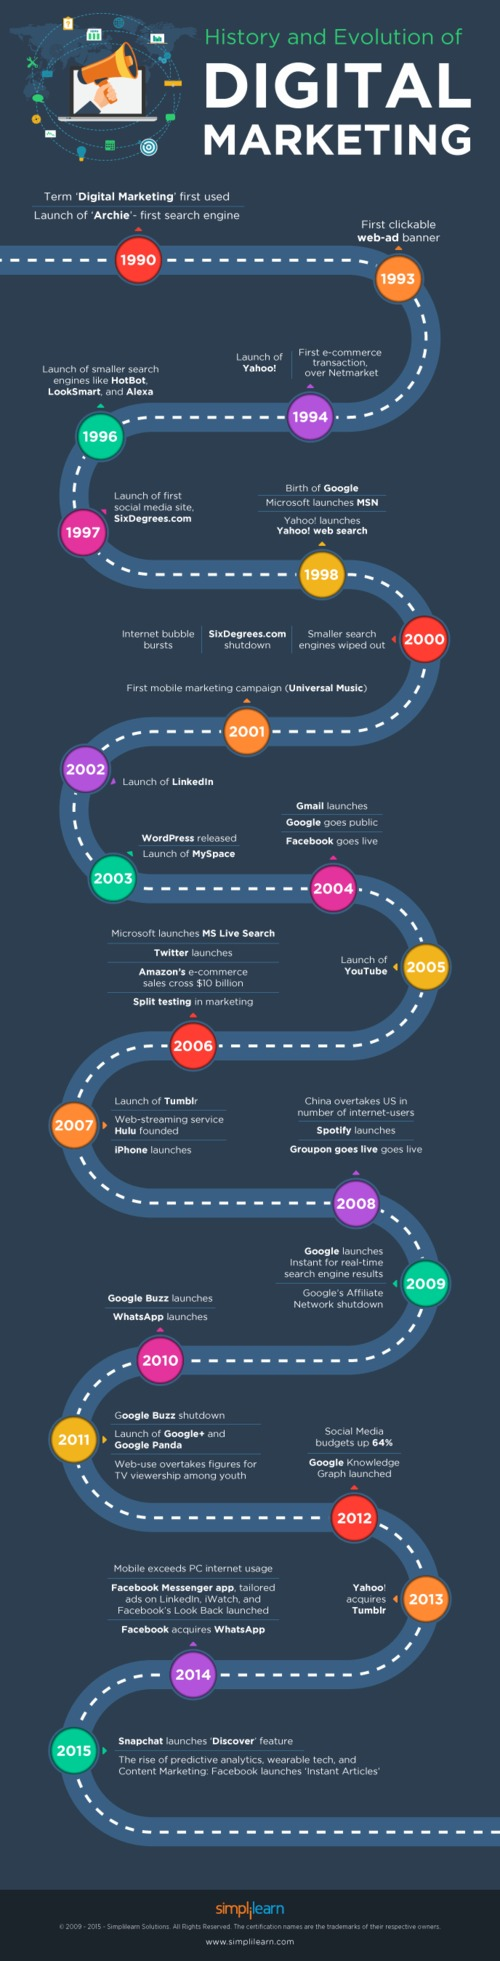 Infographic DigitalMarketing History